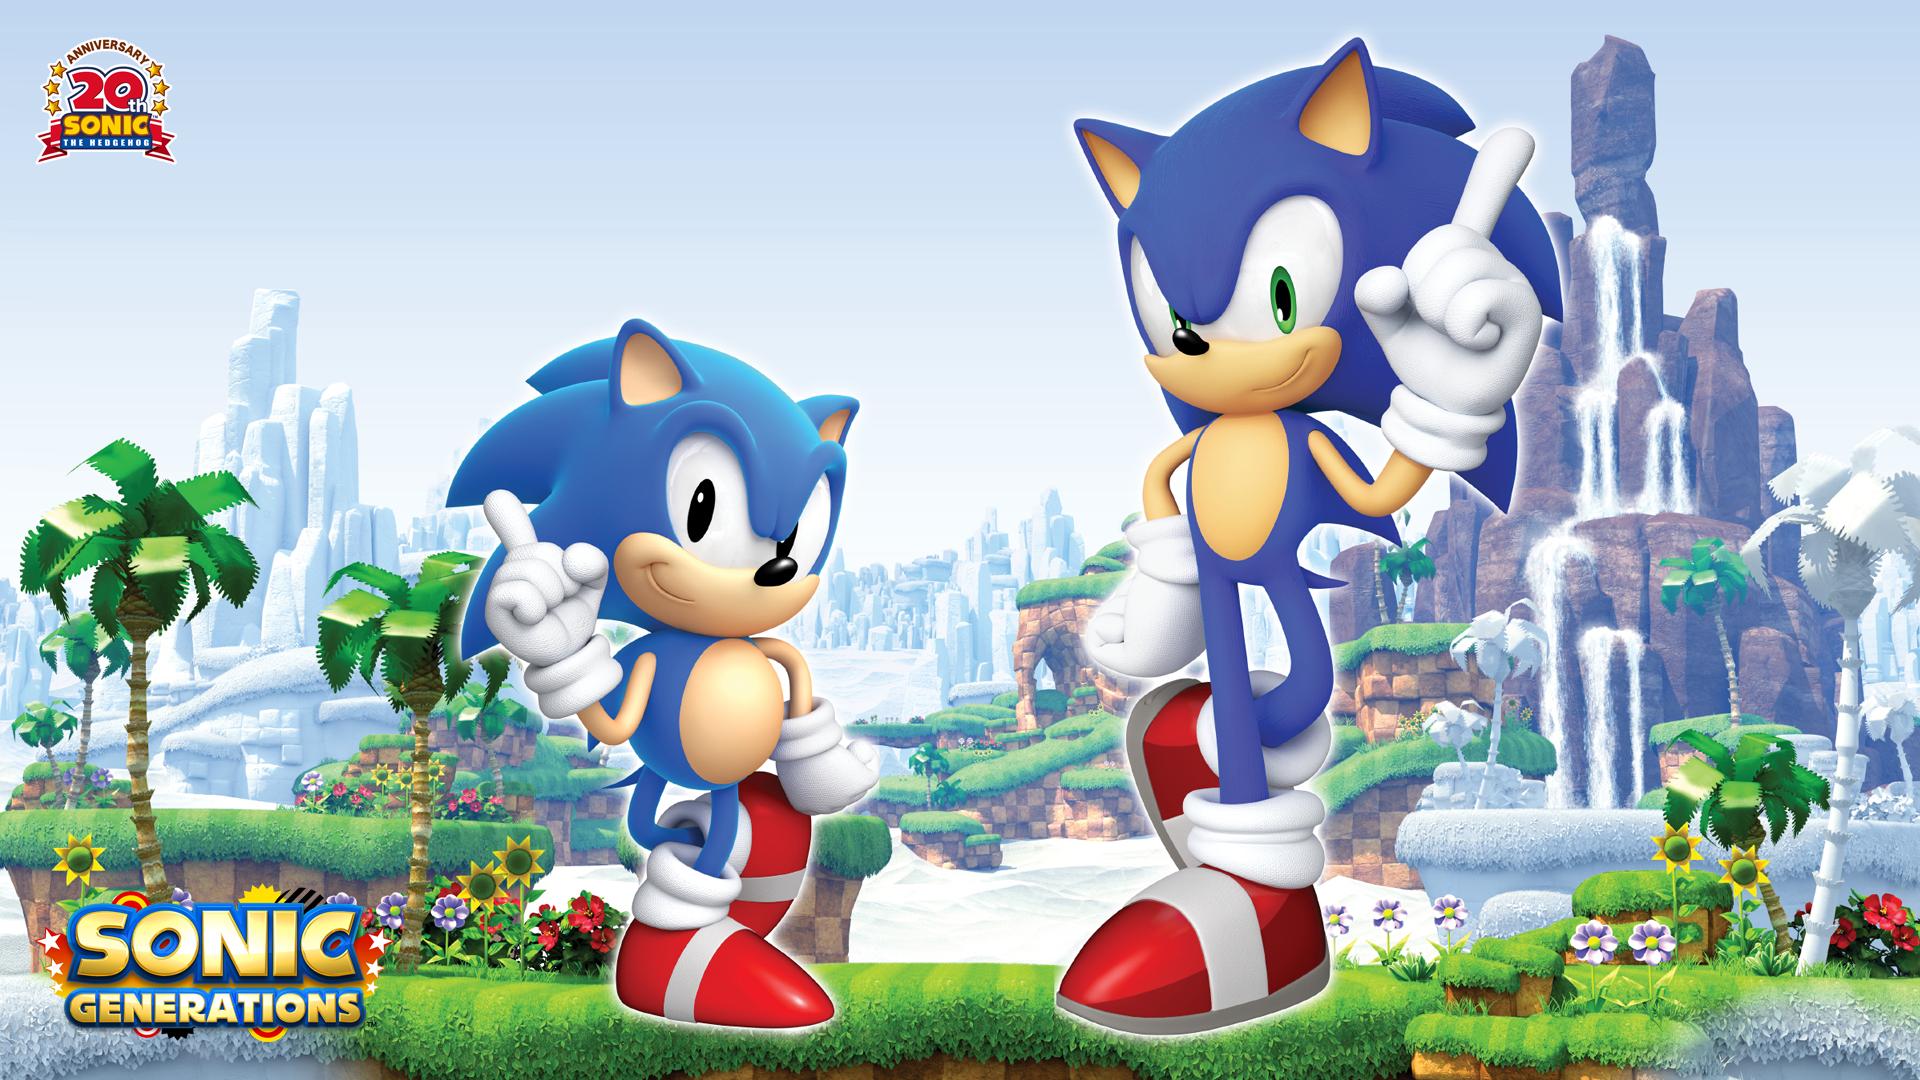 Sonic Generations Hd Wallpaper 3 1920 X 1080 Stmed Net Sonic The Hedgehog Sonic Anime